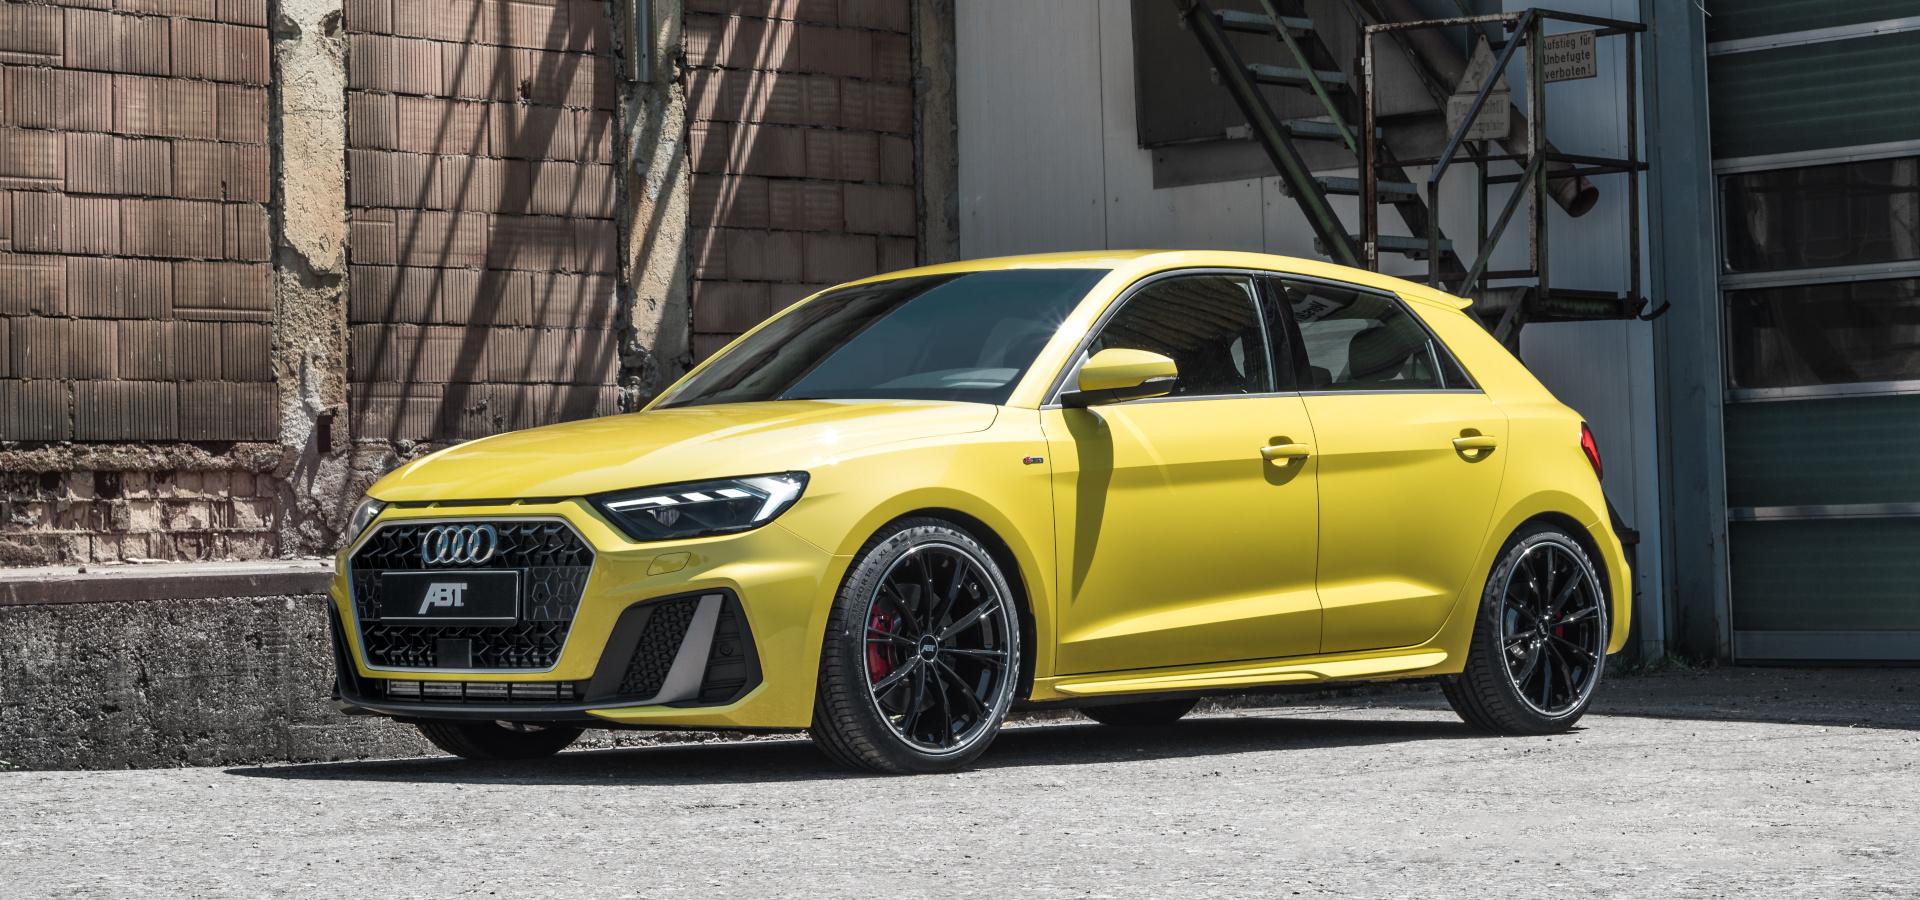 Kelebihan Kekurangan Audi R1 Review